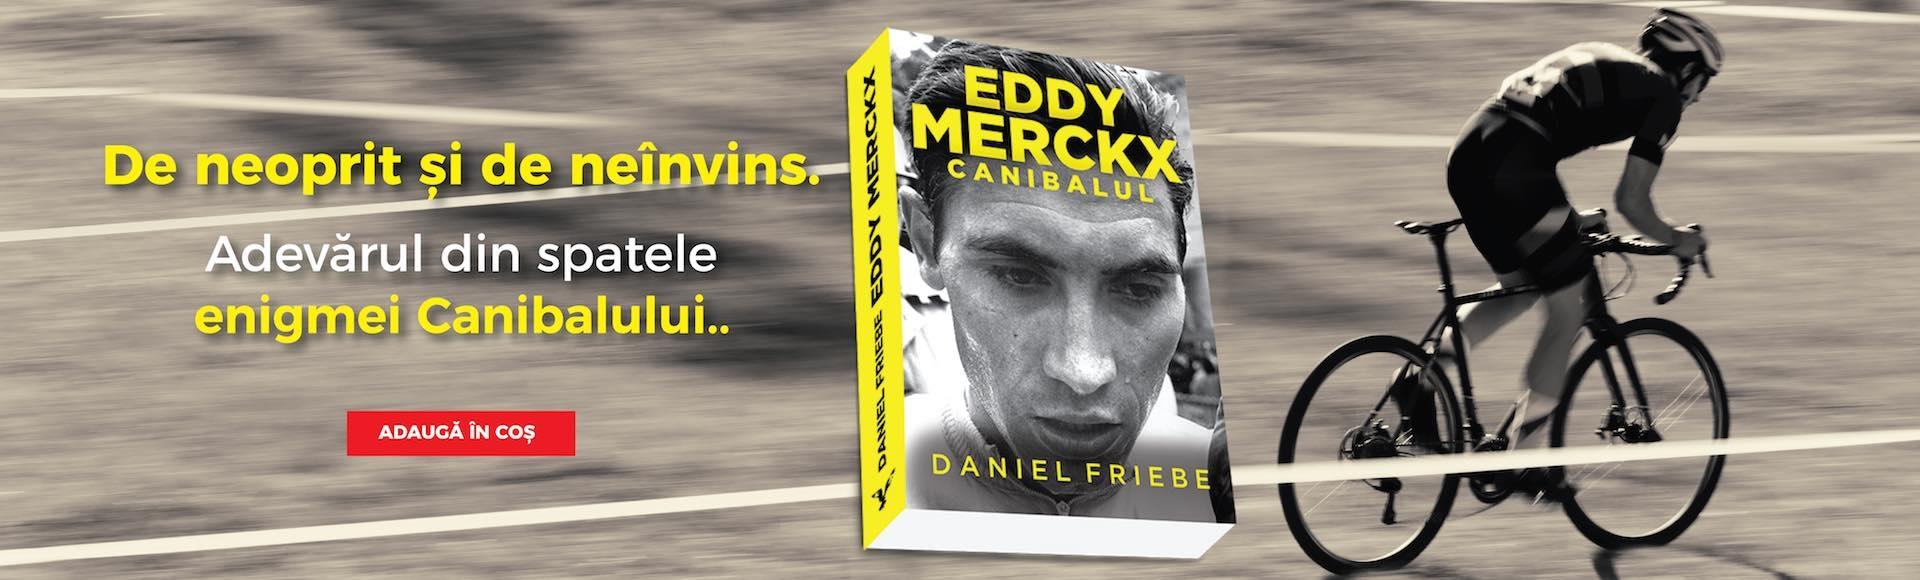 Eddy Merckx | Daniel Friebe